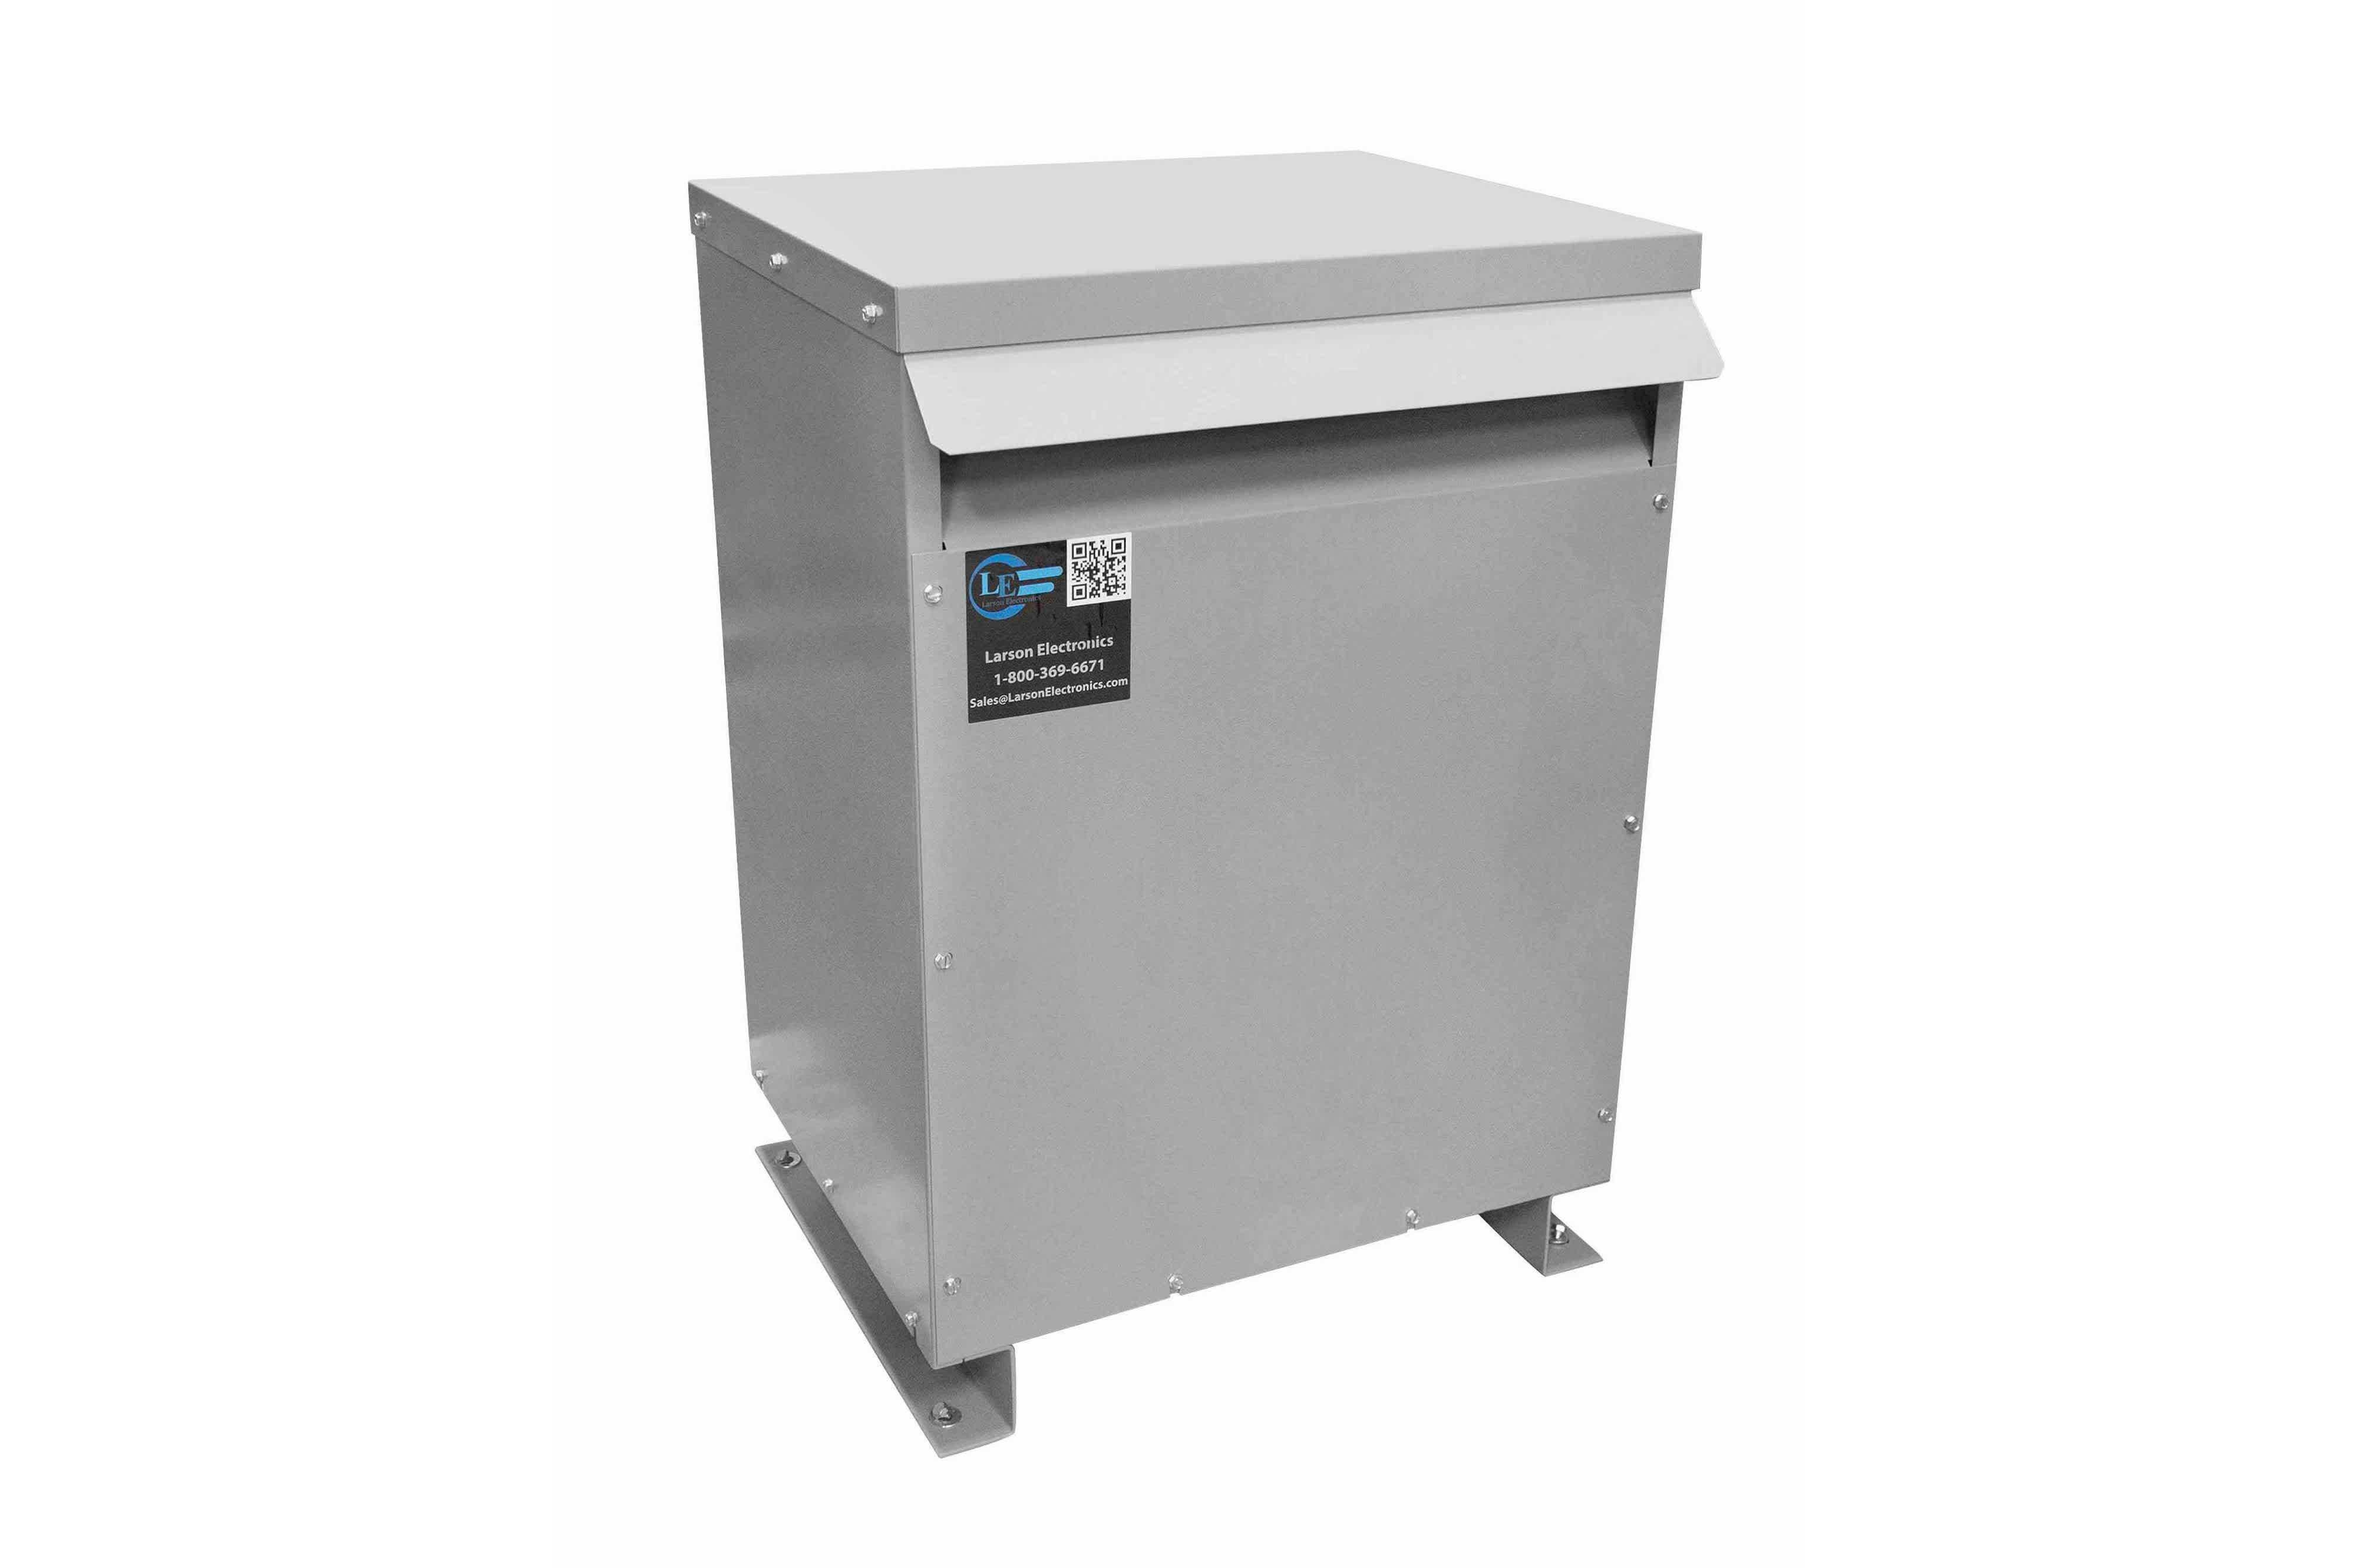 250 kVA 3PH Isolation Transformer, 240V Wye Primary, 480Y/277 Wye-N Secondary, N3R, Ventilated, 60 Hz